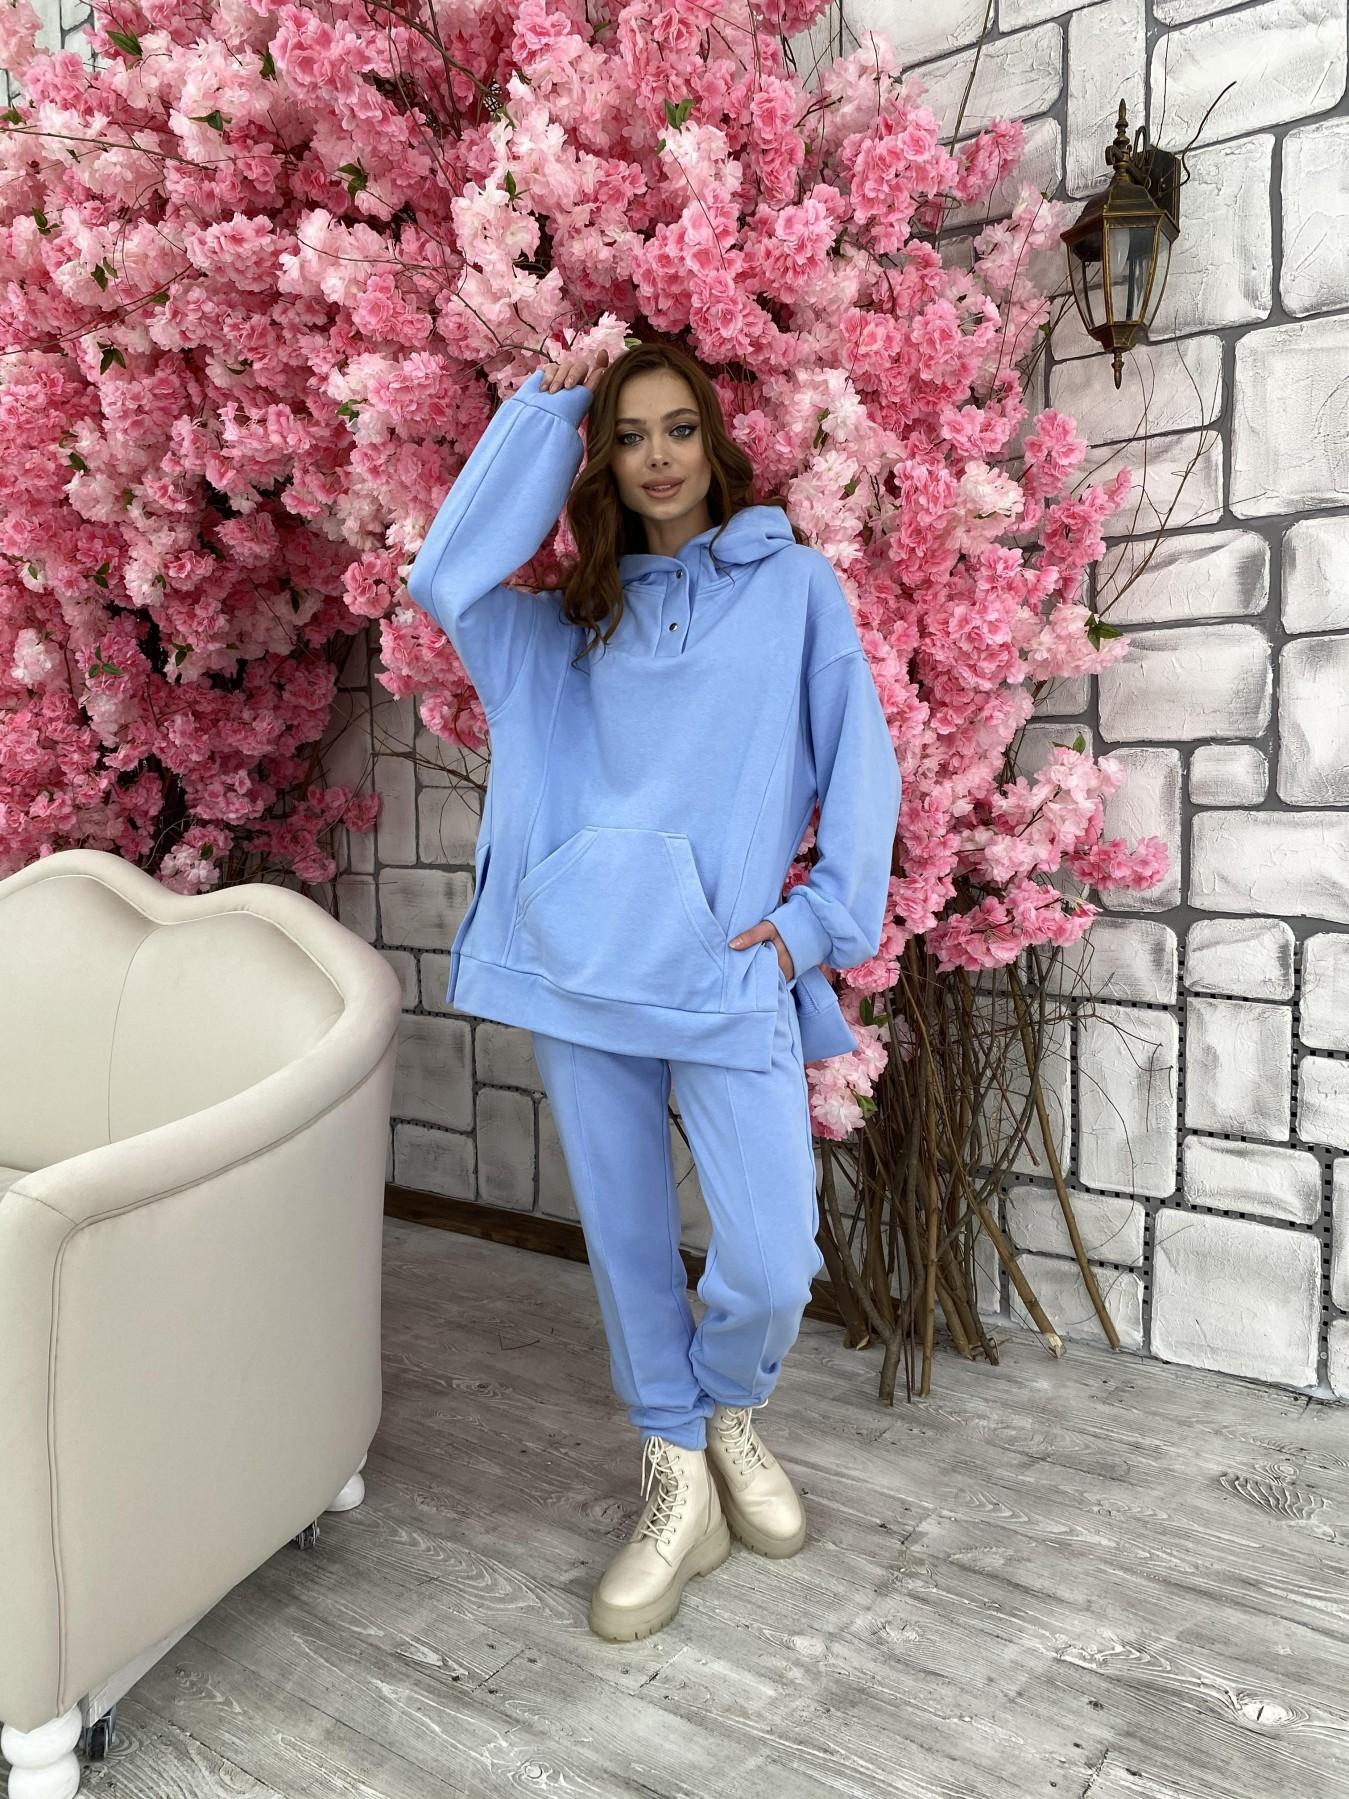 Лайф костюм  из 3х нитки 10782 АРТ. 47255 Цвет: Голубой - фото 7, интернет магазин tm-modus.ru